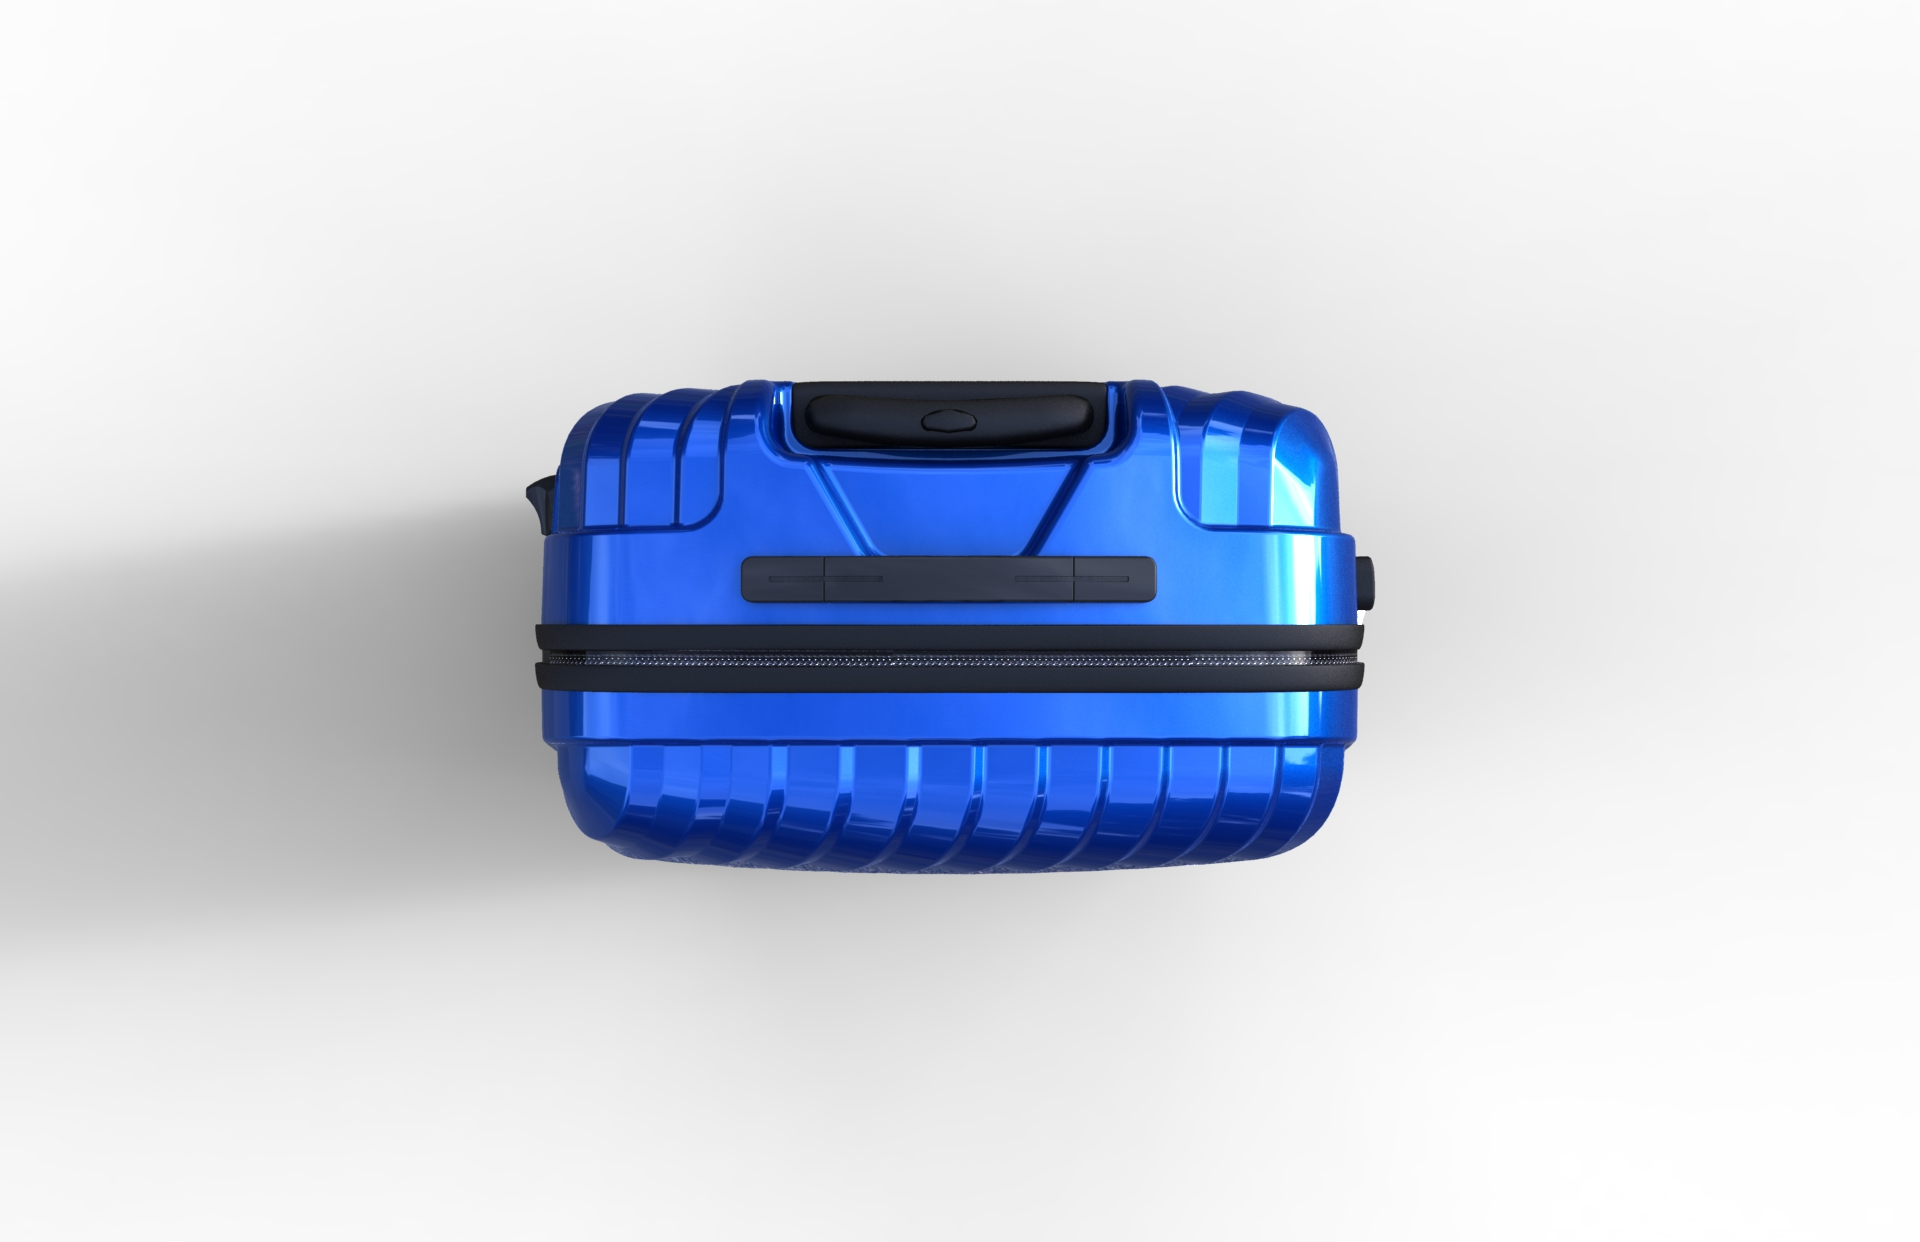 trolley suitcase bag 03 3d model max fbx ma mb obj 286009